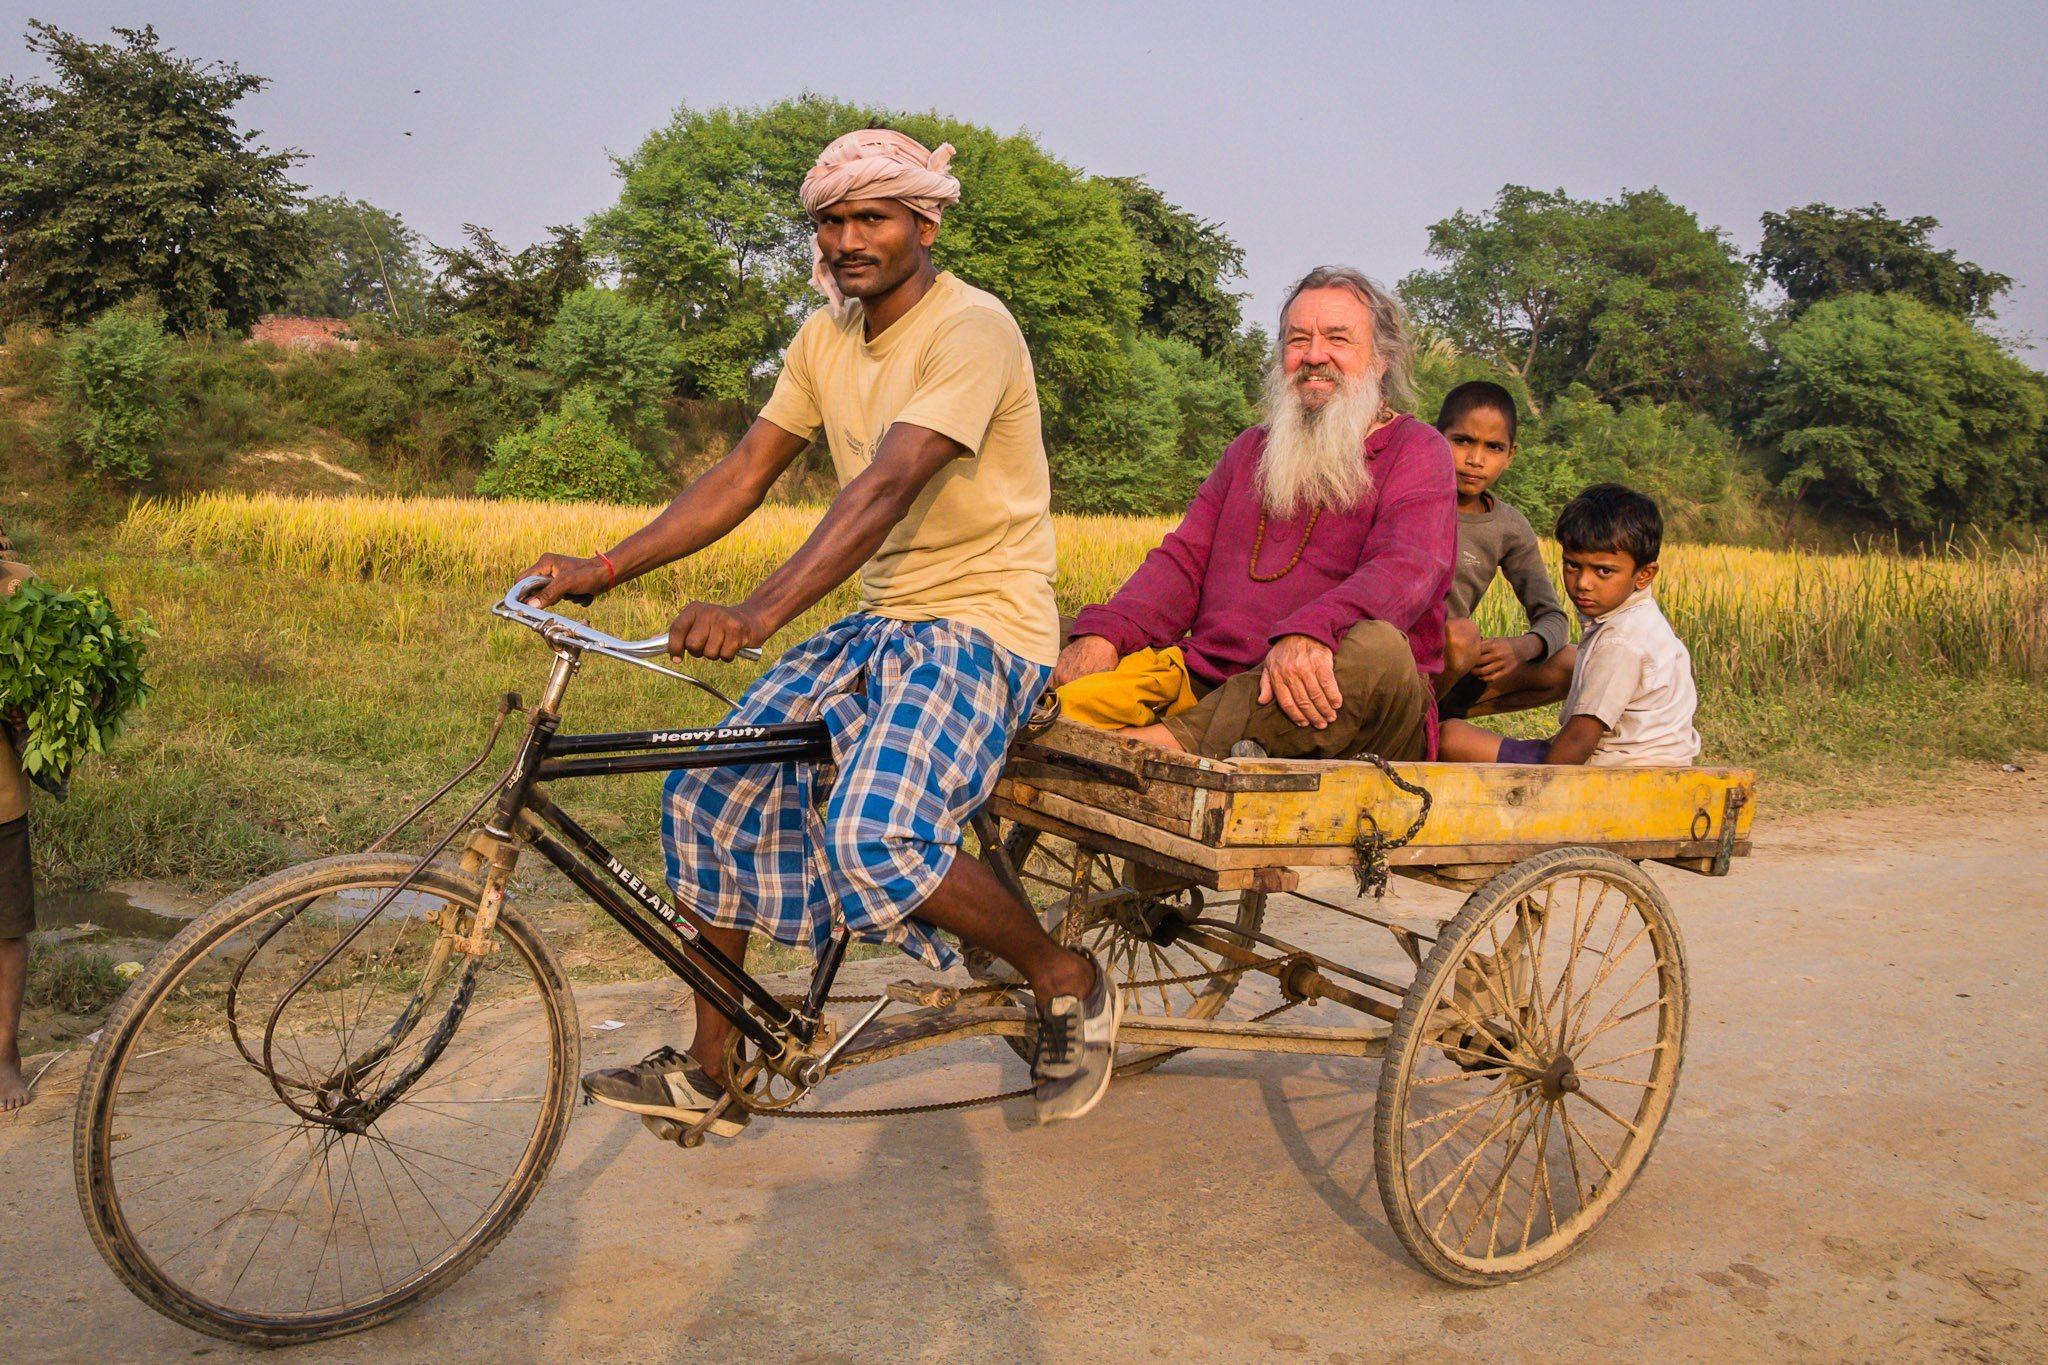 Wolf-Dieter Storl in Indien